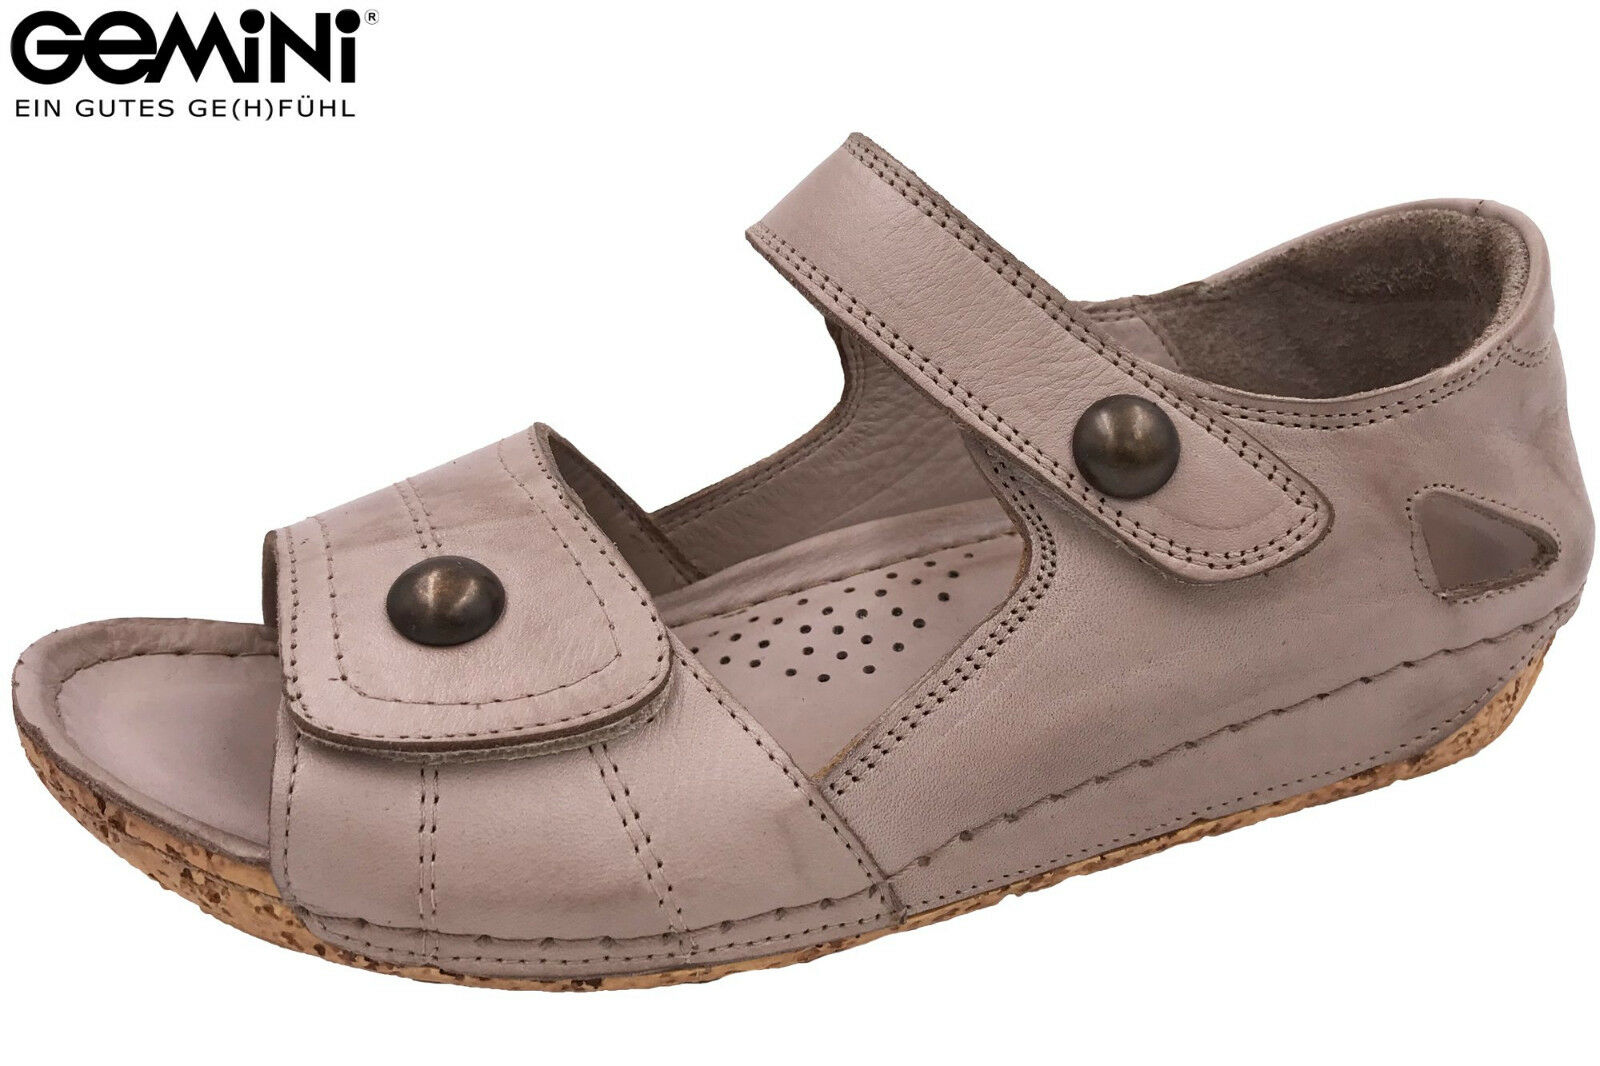 Gemini Damen Sandalee Grau Beige Taupe Leder Sommer Schuhe 32093 NEU